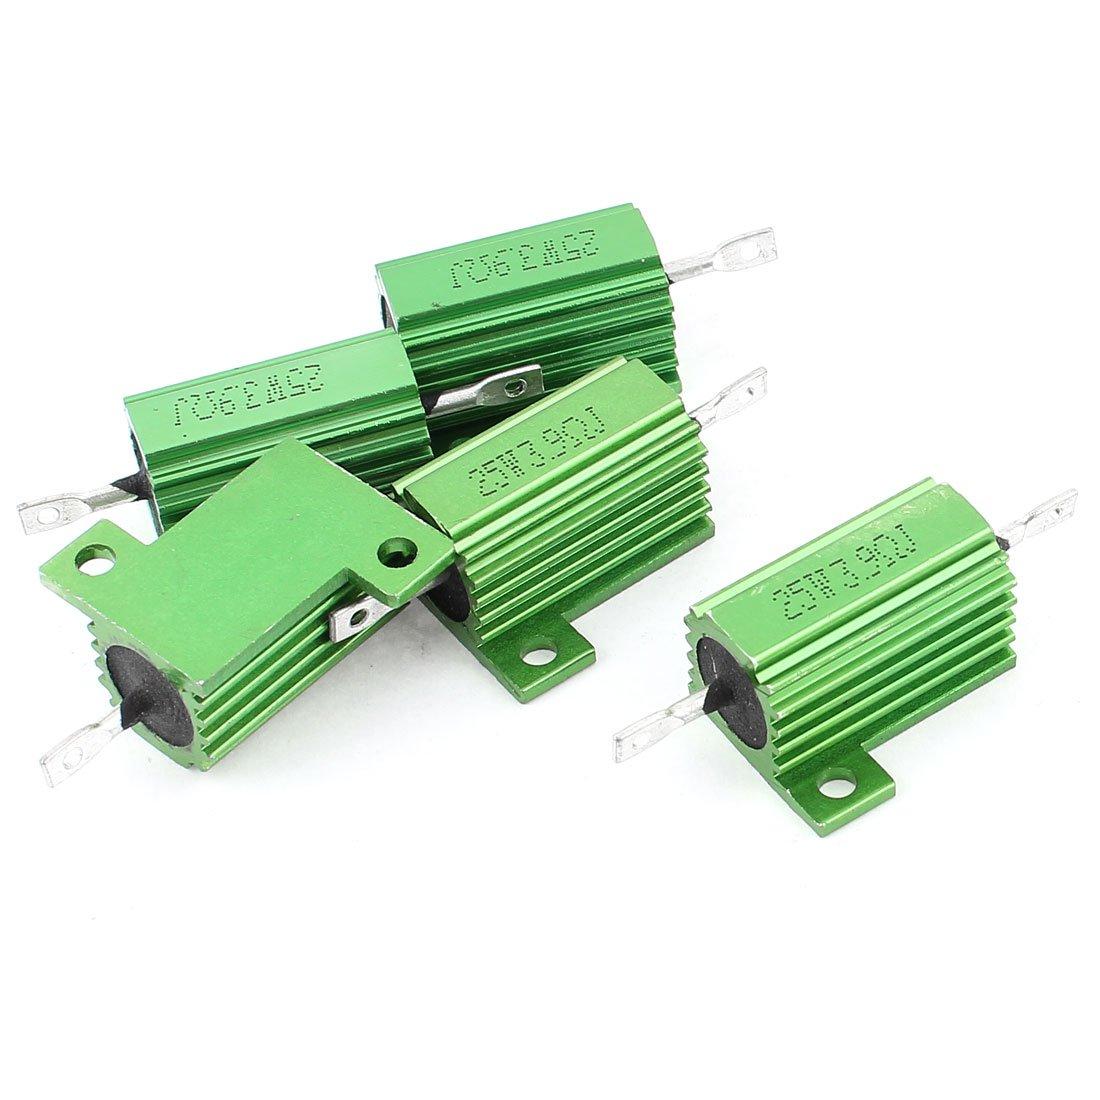 uxcell 5 Pcs Green Heatsink Aluminum Housed 25Watt 3.9Ohm Wirewound Resistors